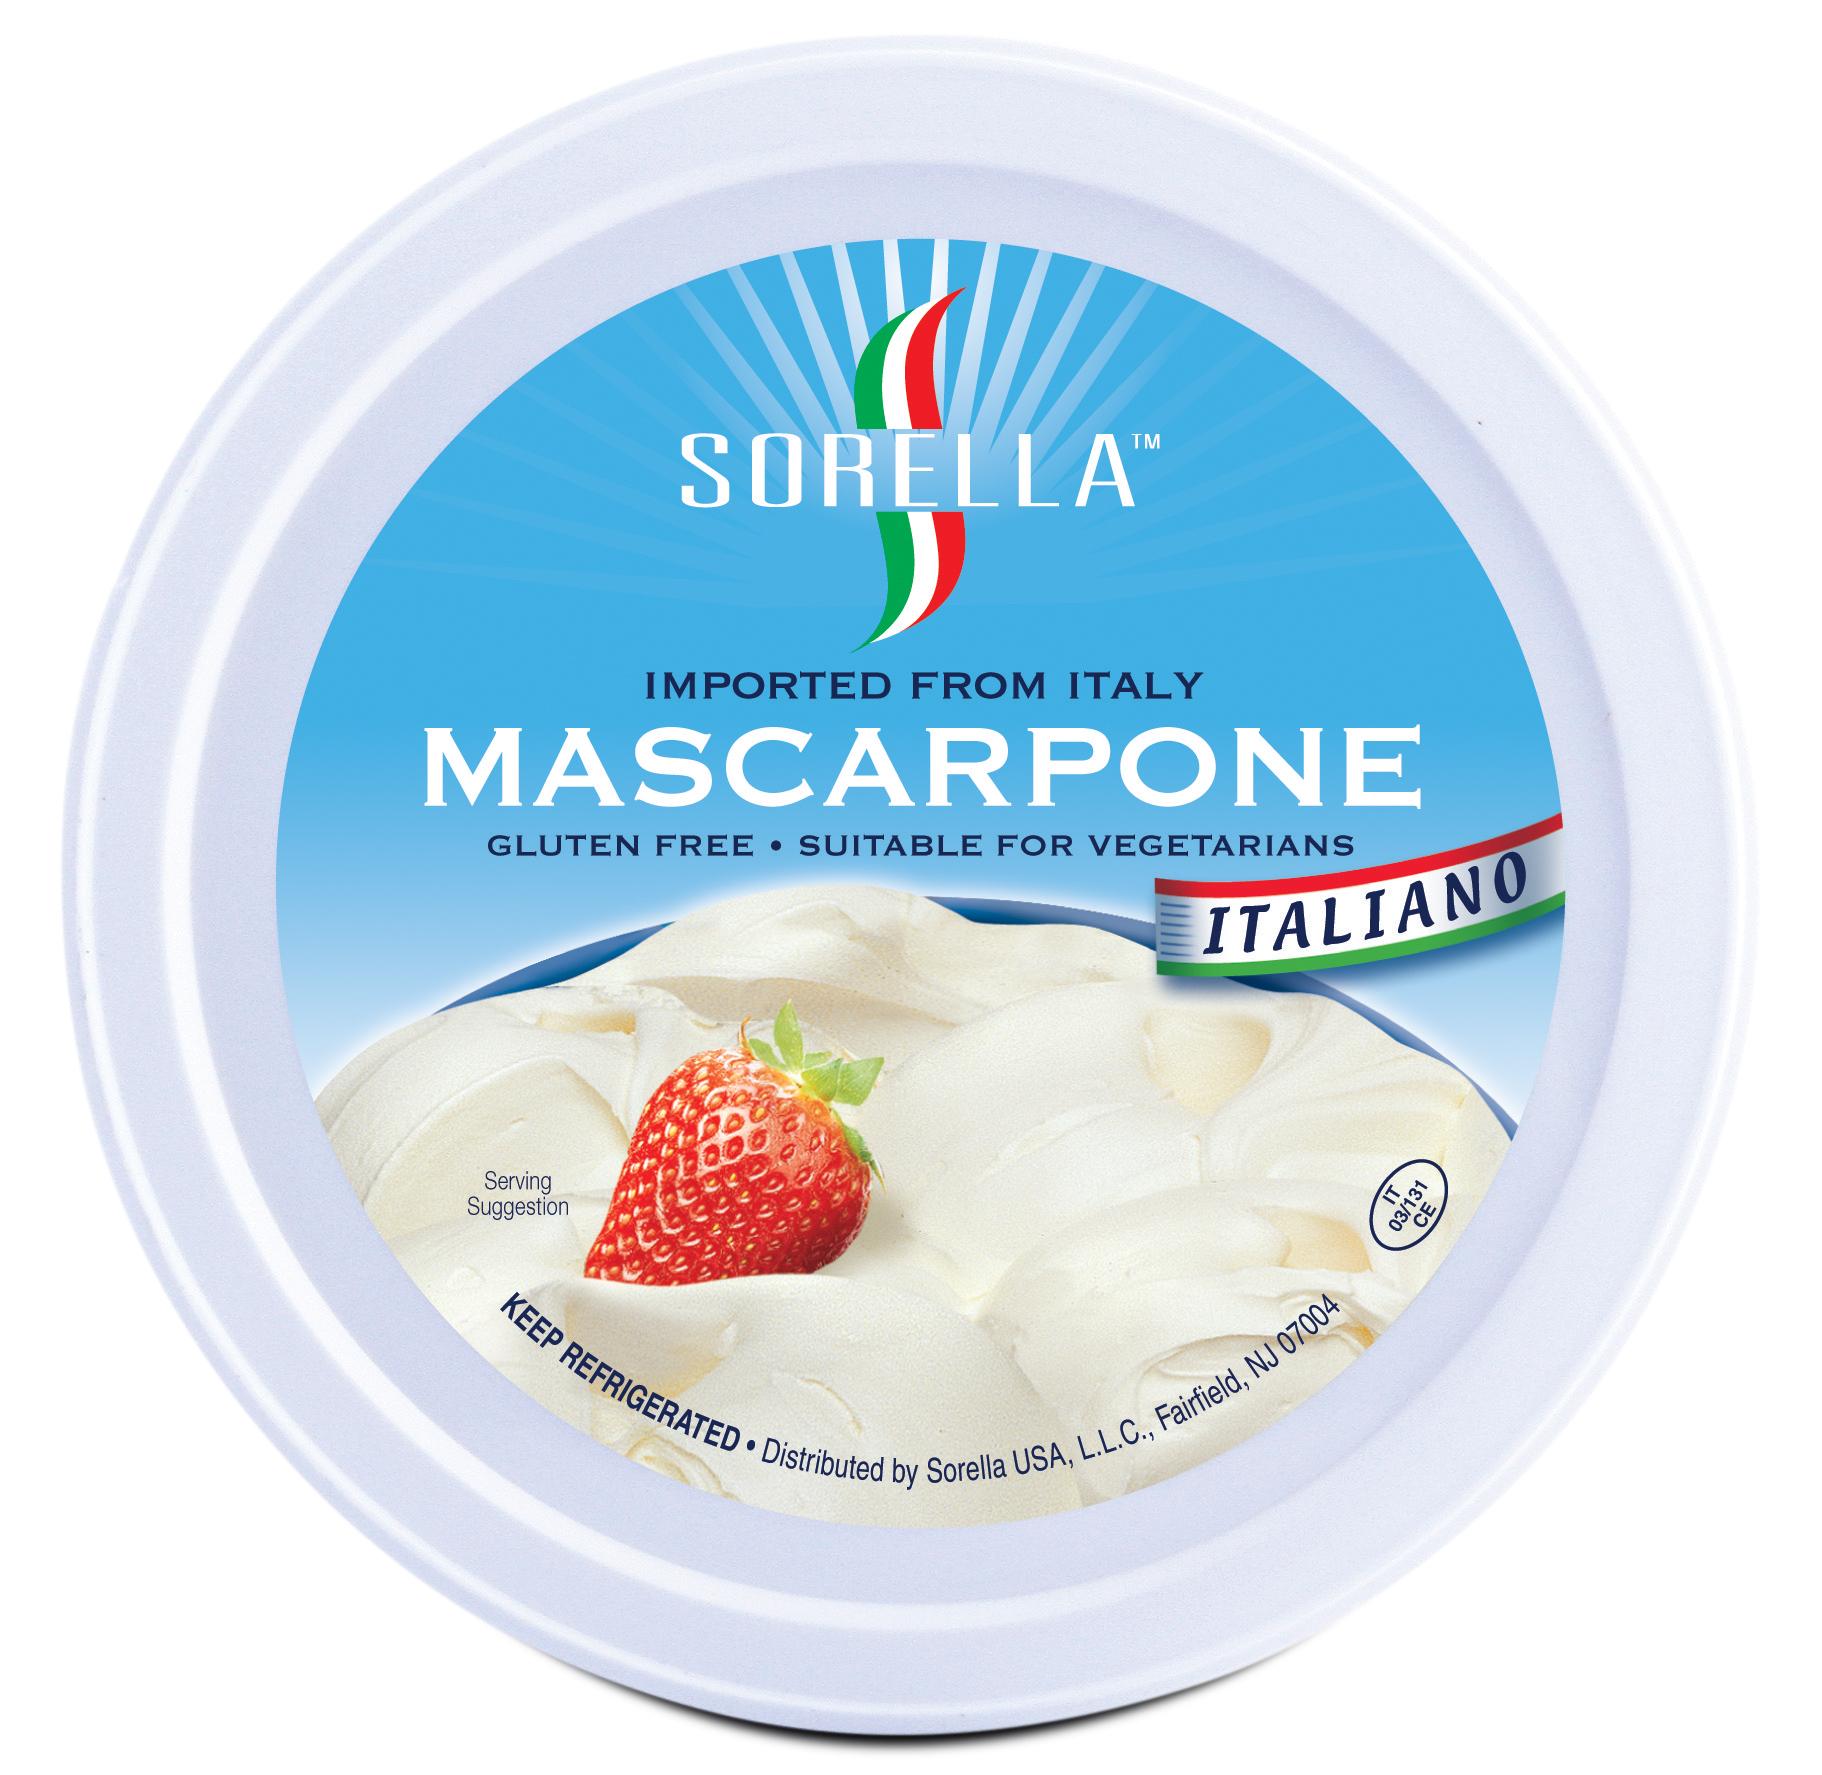 Sorella usa for What to do with mascarpone